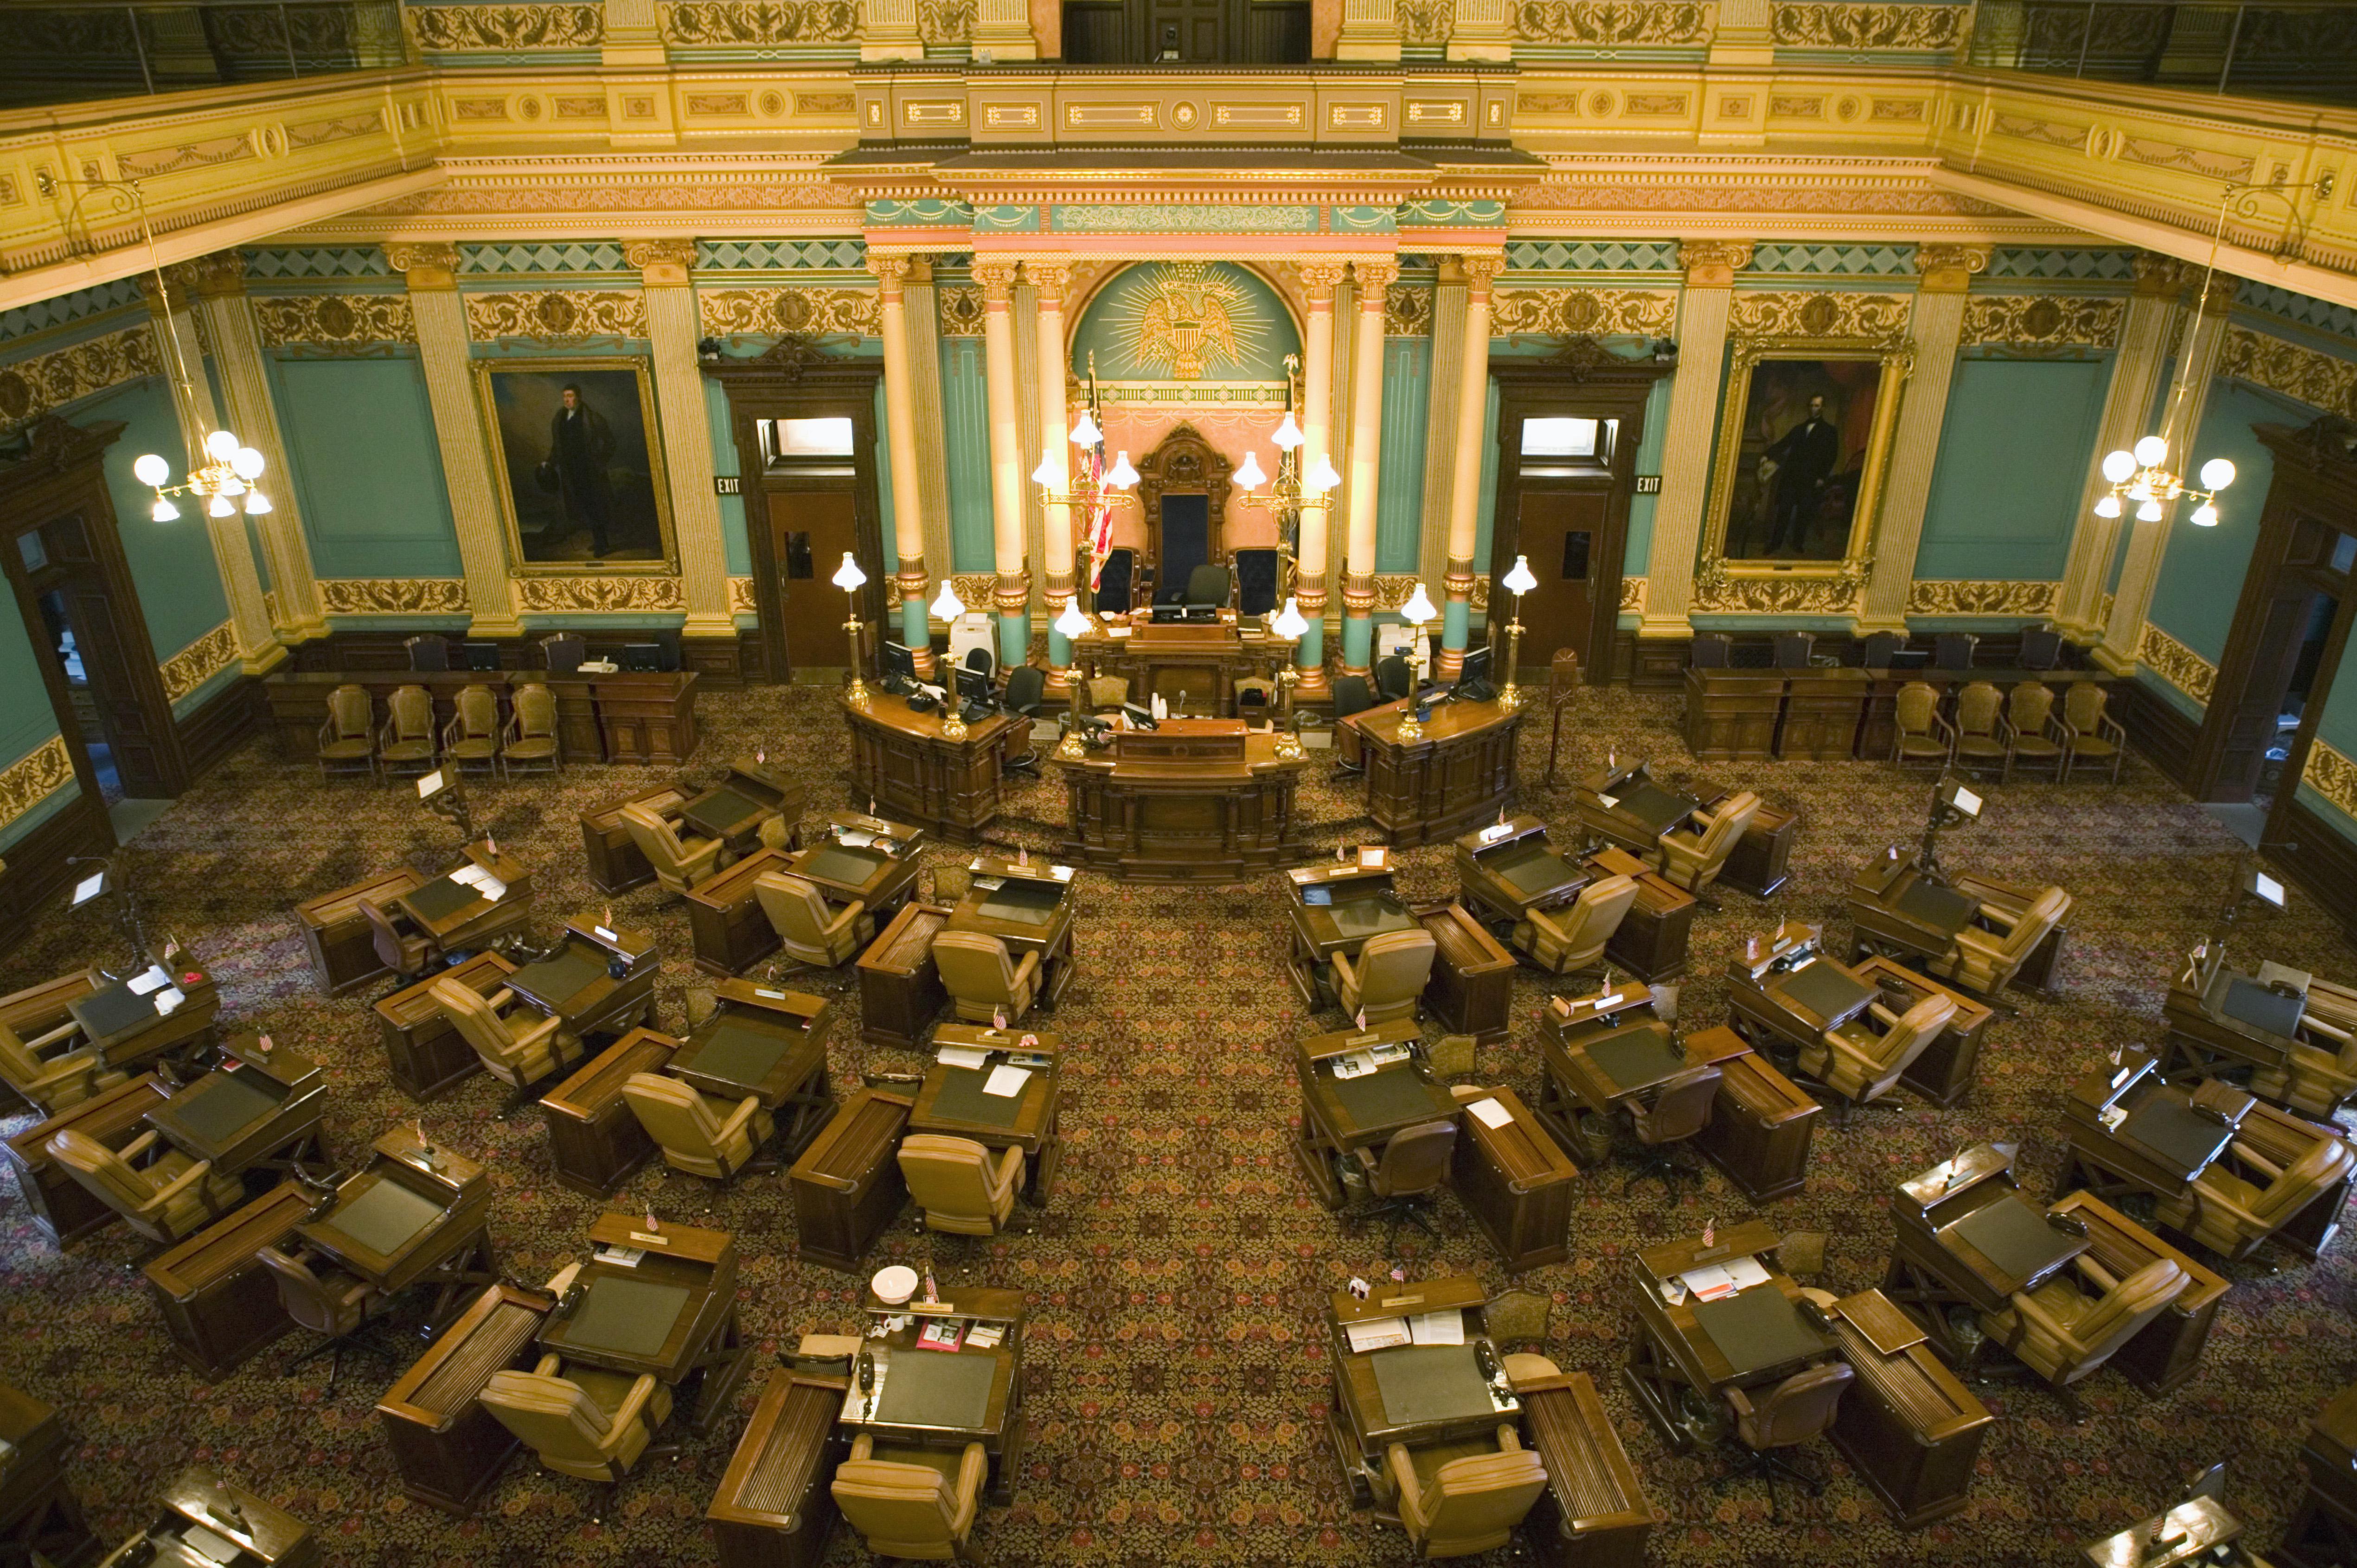 State Senate Chamber in Michigan State Capitol, Lansing, Michigan, USA